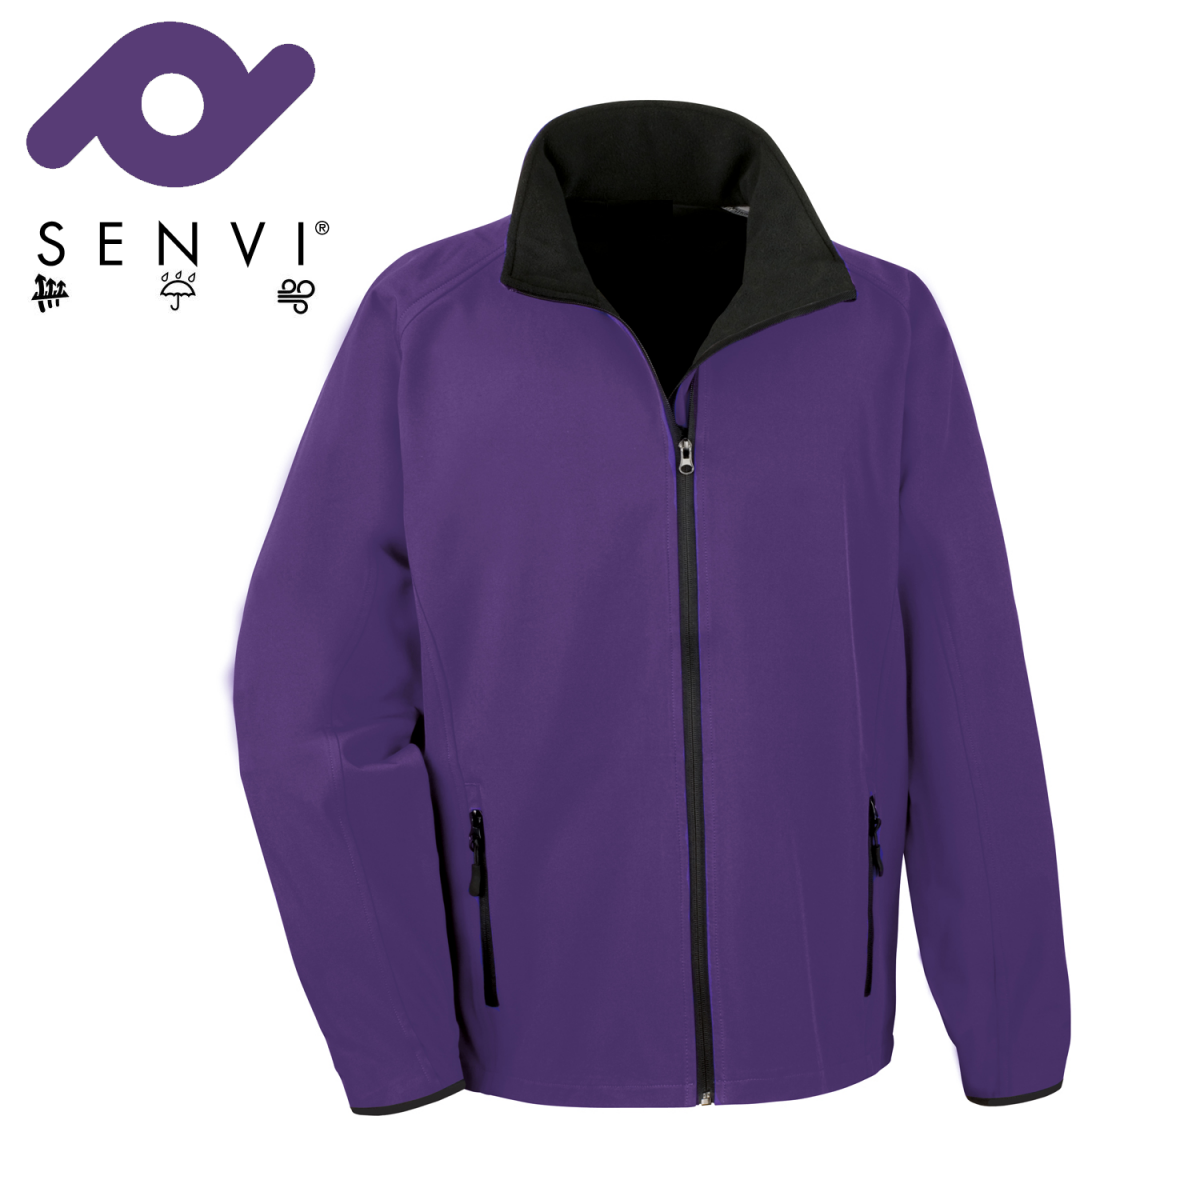 Senvi Softshell Jas - Kleur Paars//Zwart- Maat M